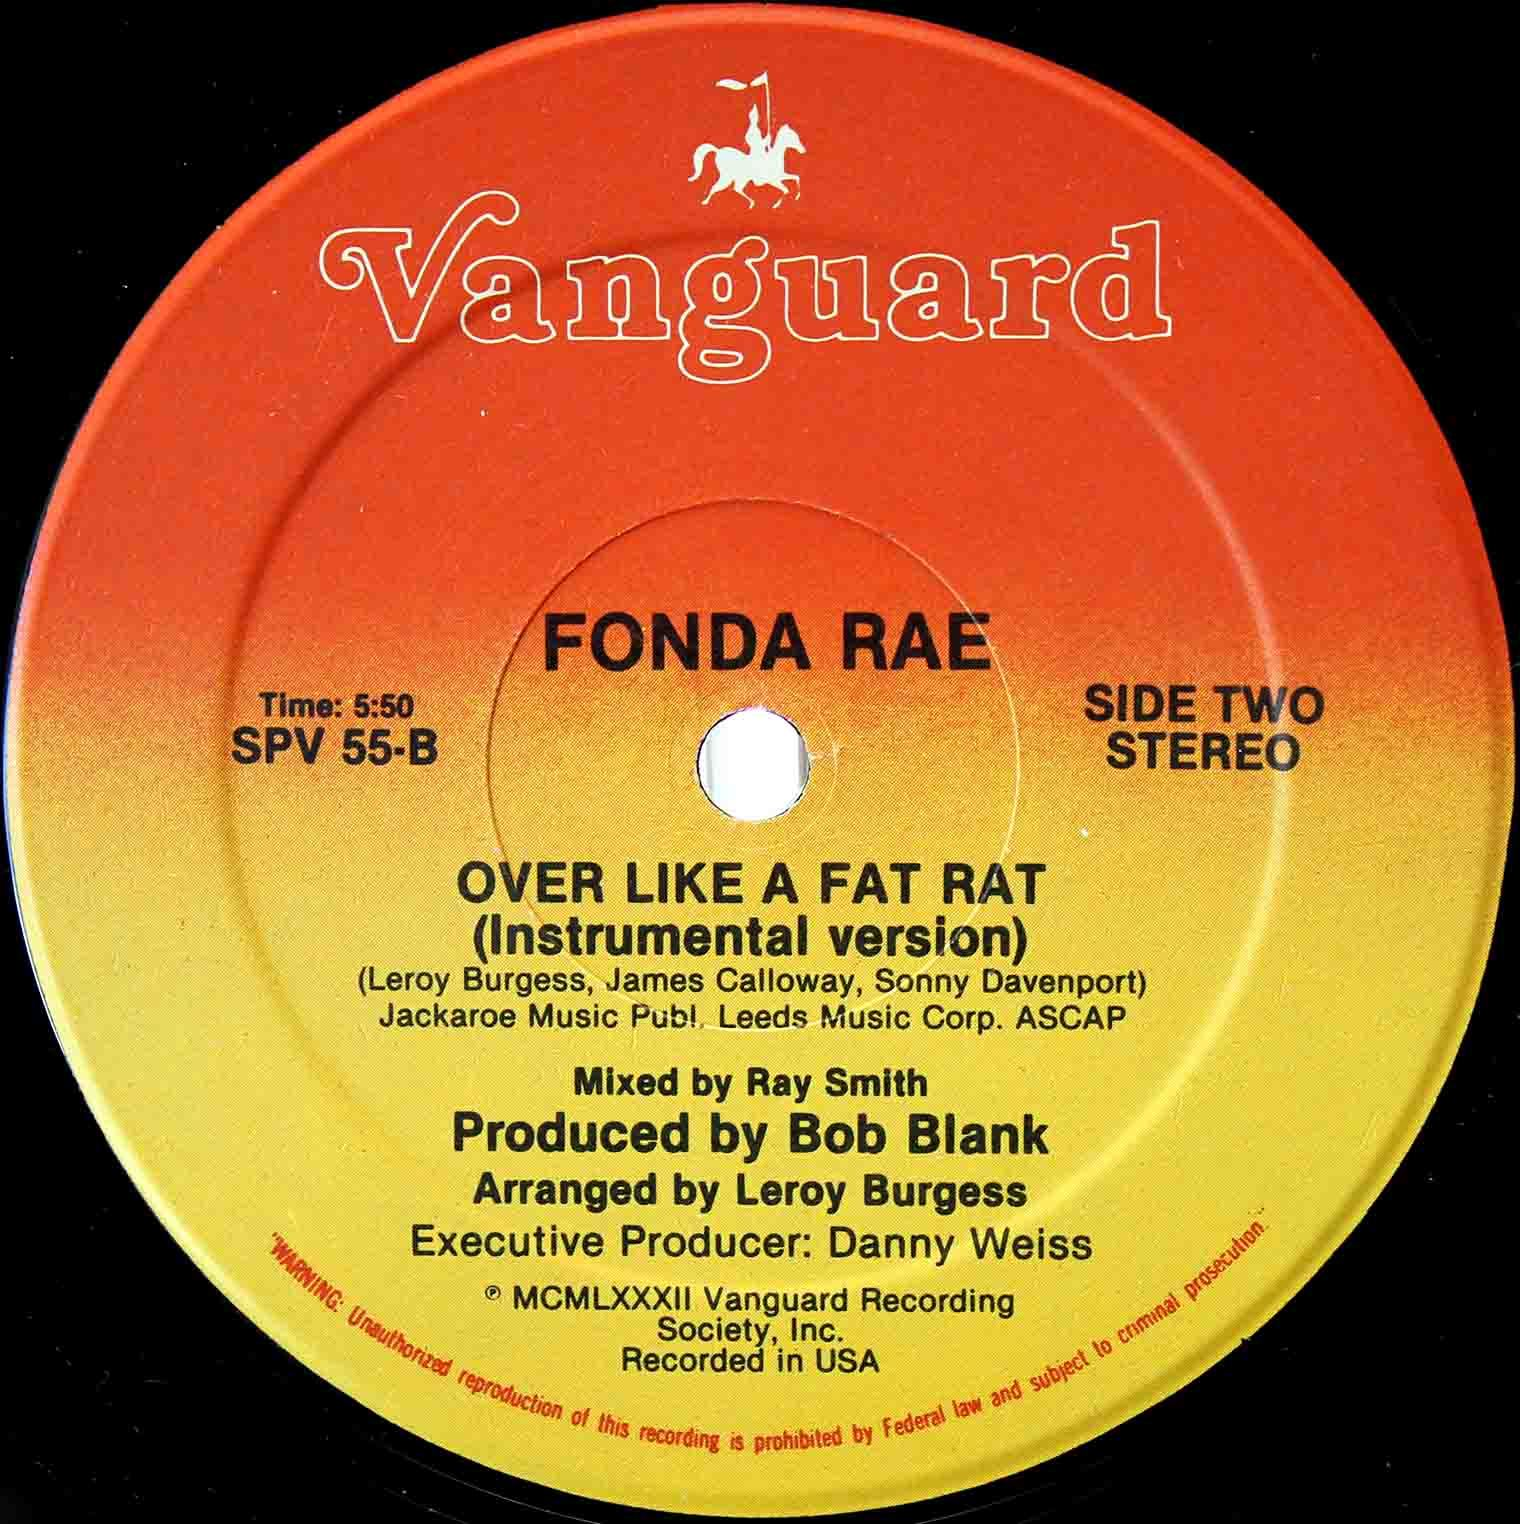 Fonda Rae Over Like Fat Rat 04